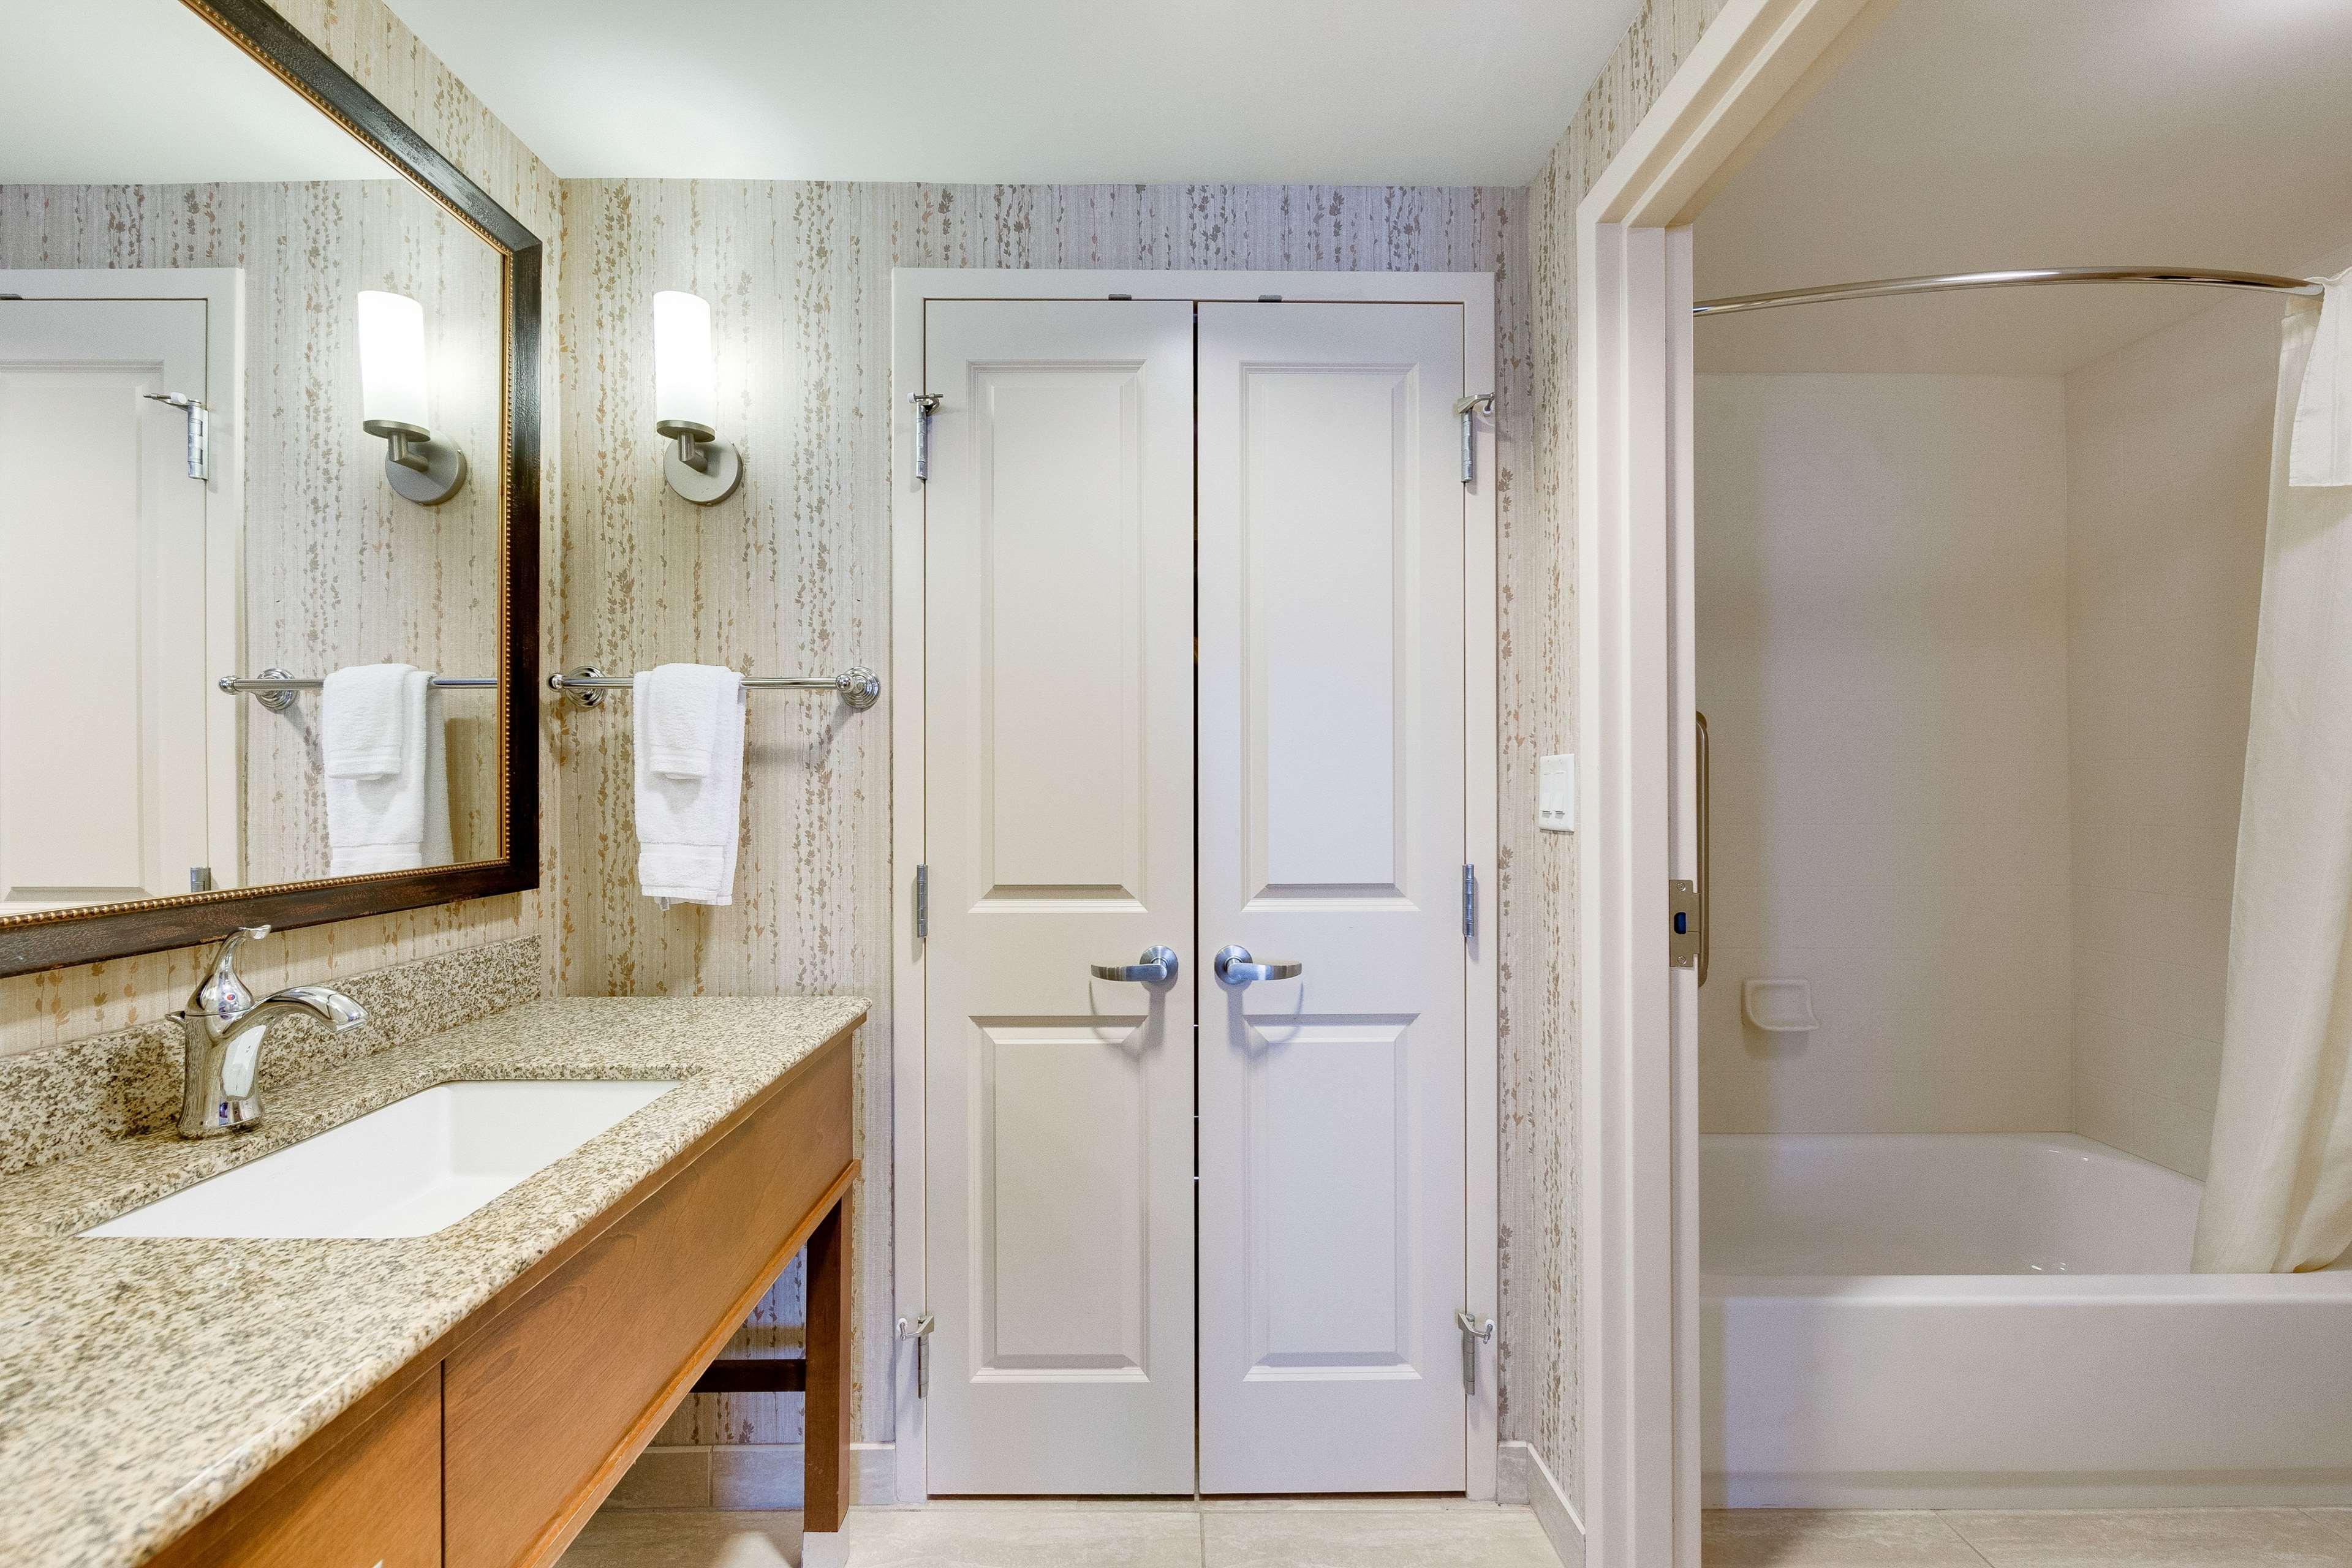 Homewood Suites by Hilton Fort Worth - Medical Center, TX image 14